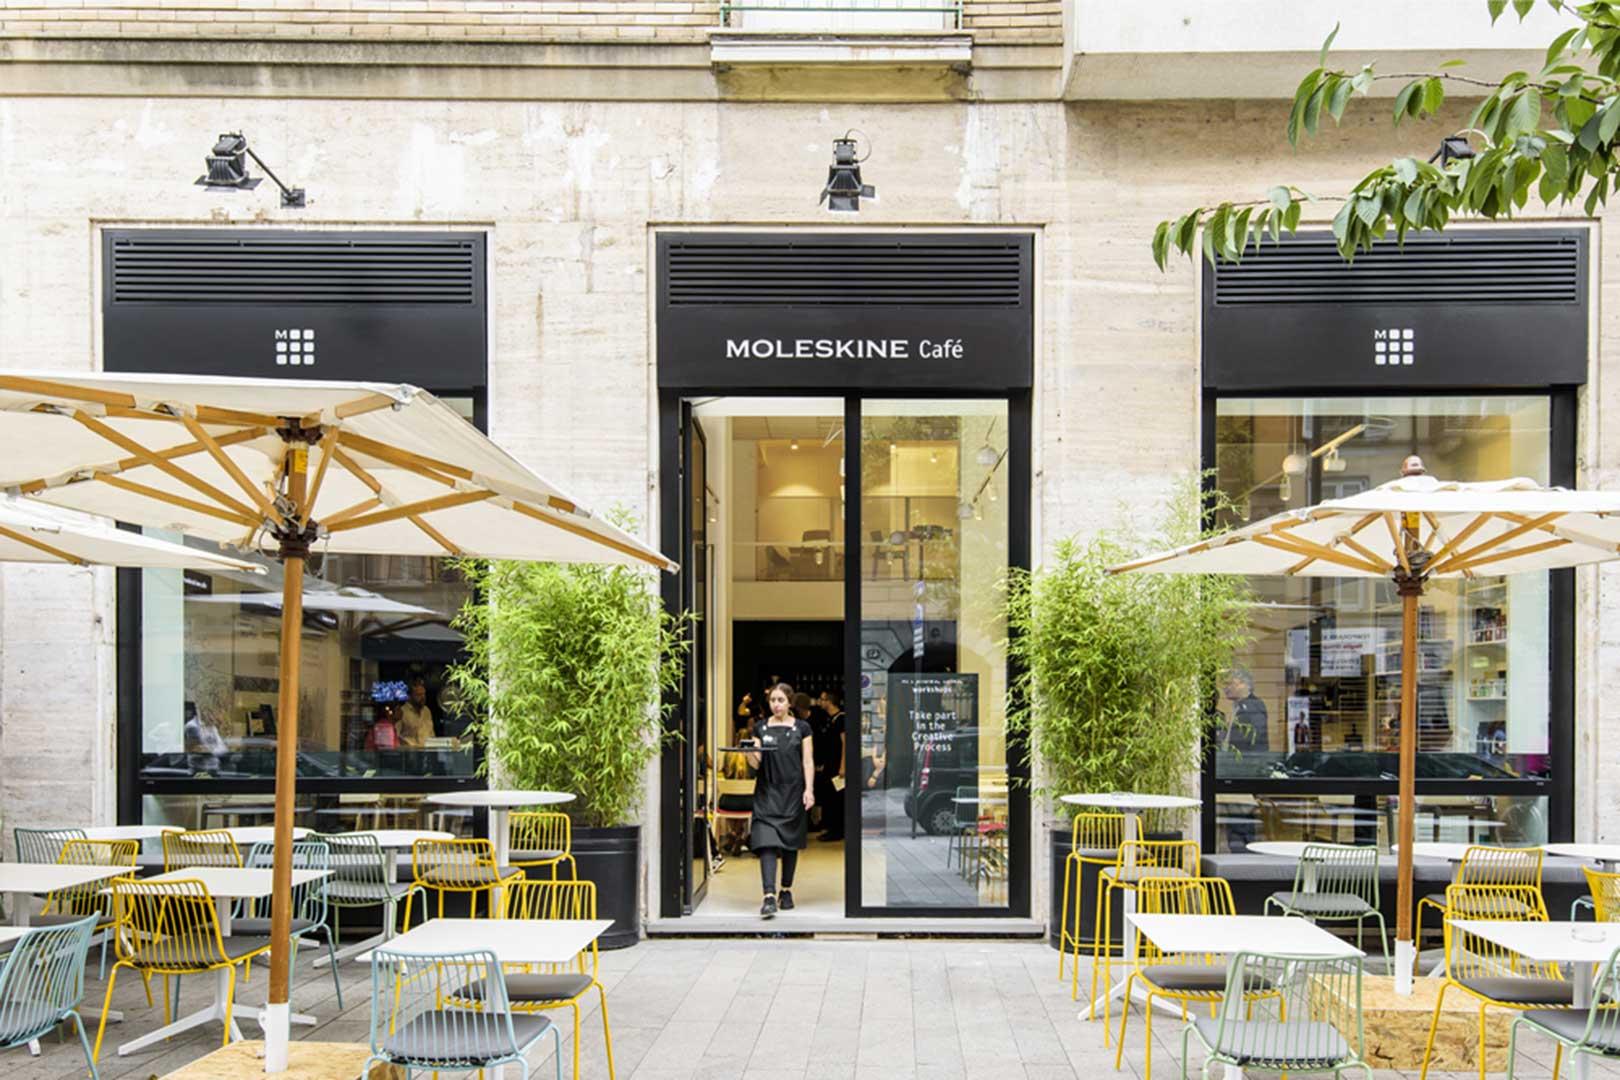 Moleskine Cafe Entrance